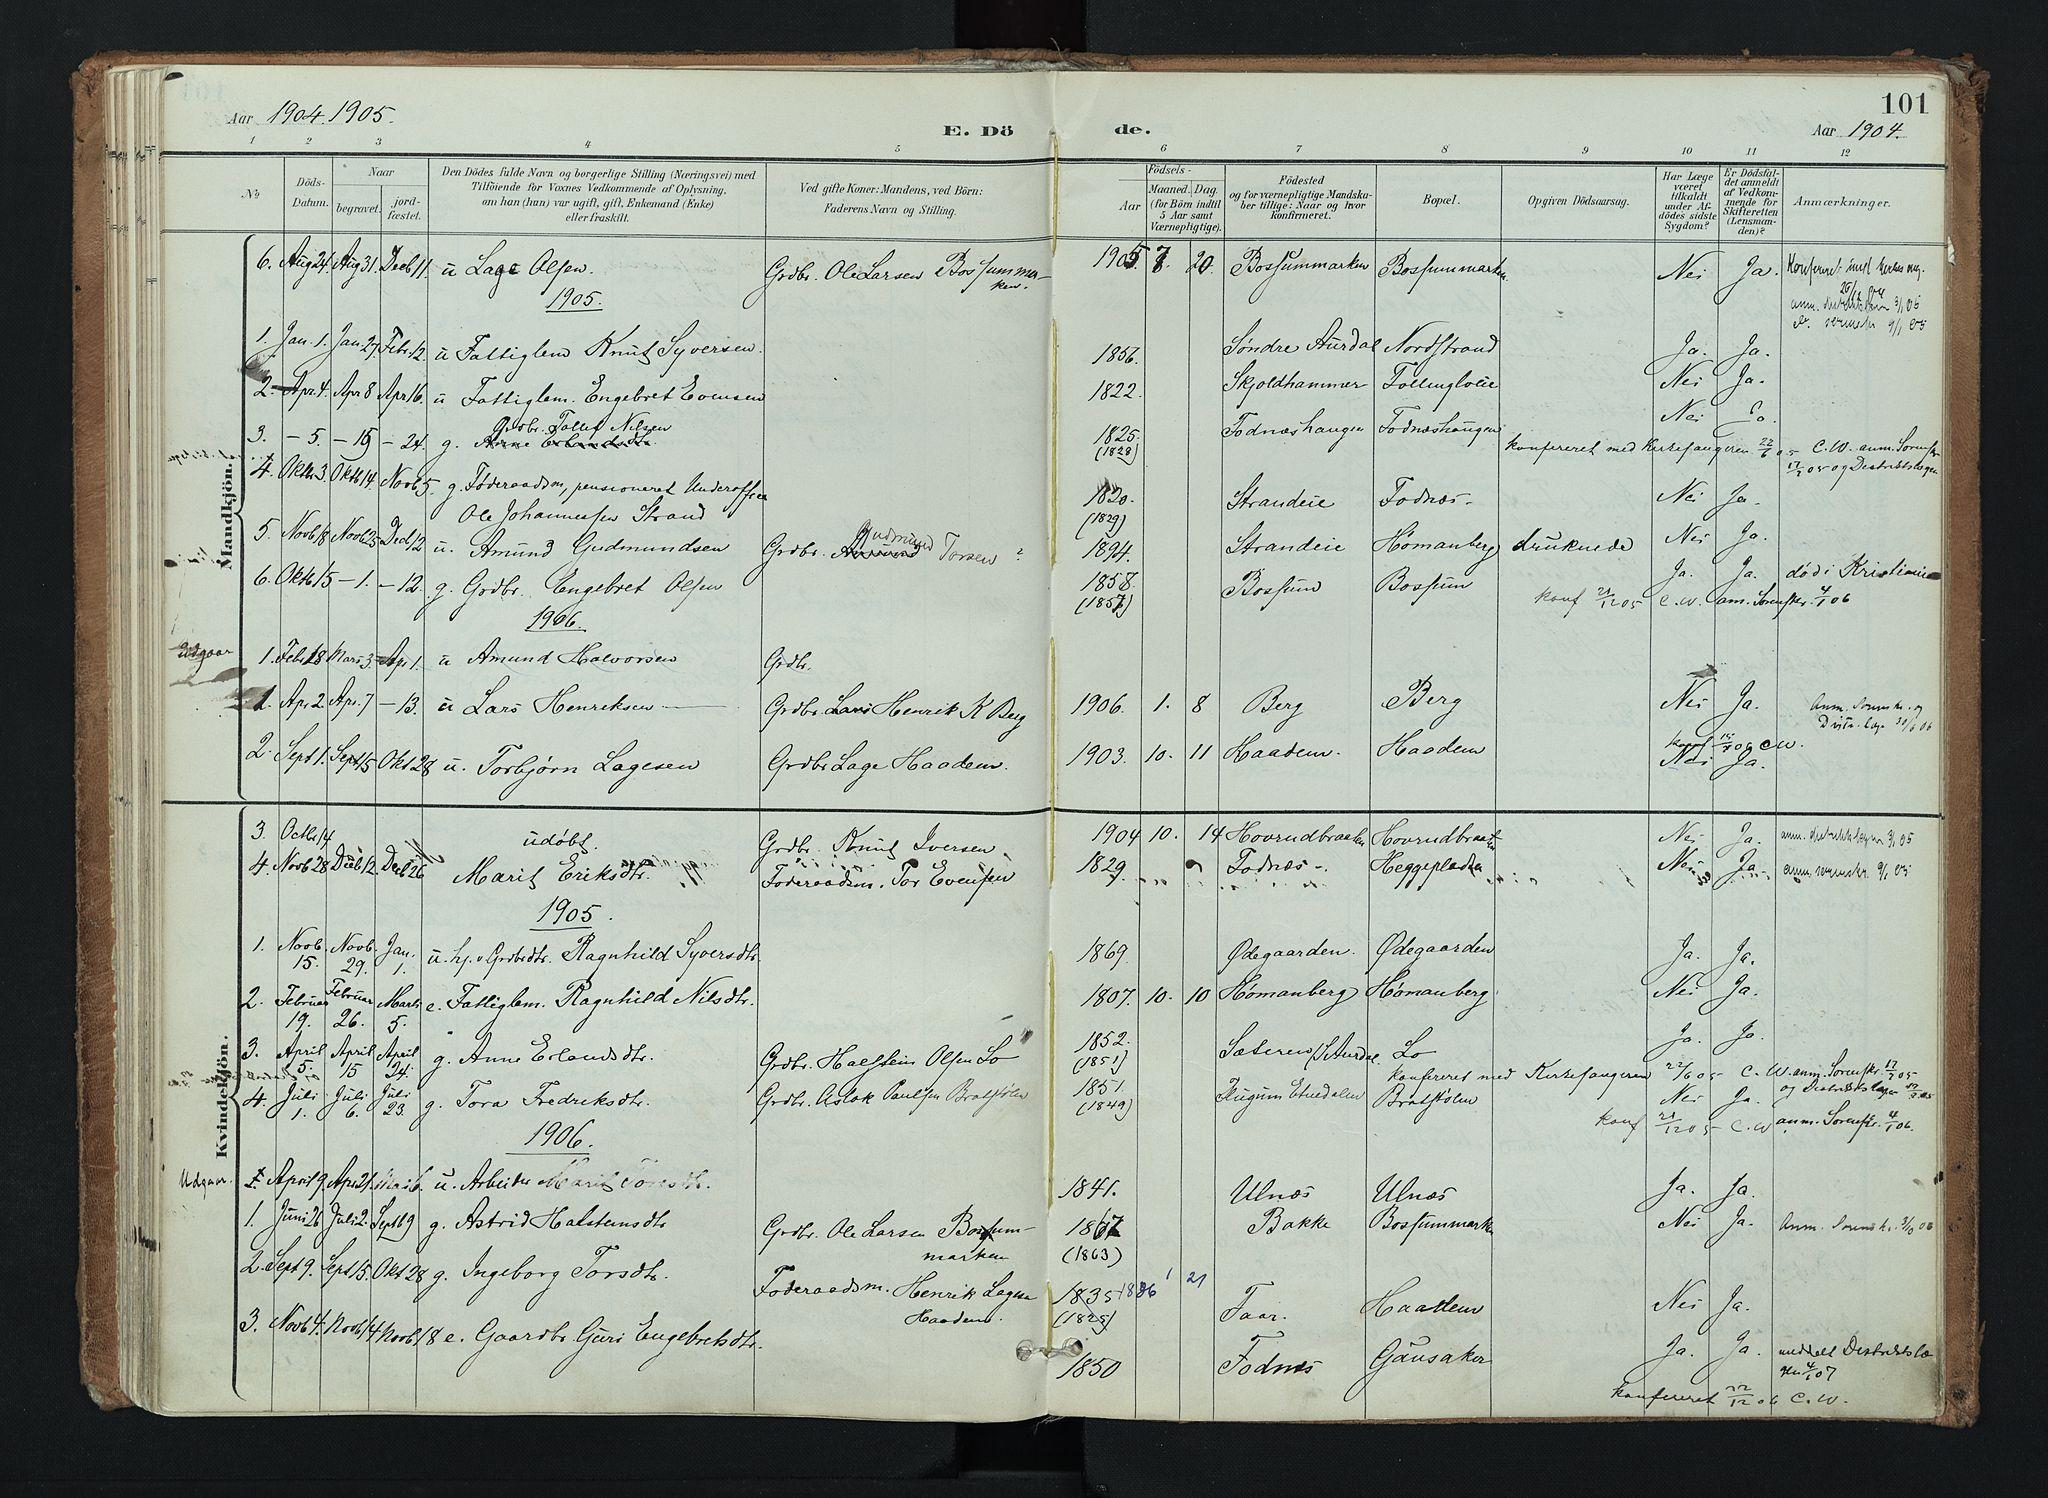 SAH, Nord-Aurdal prestekontor, Ministerialbok nr. 16, 1897-1925, s. 101